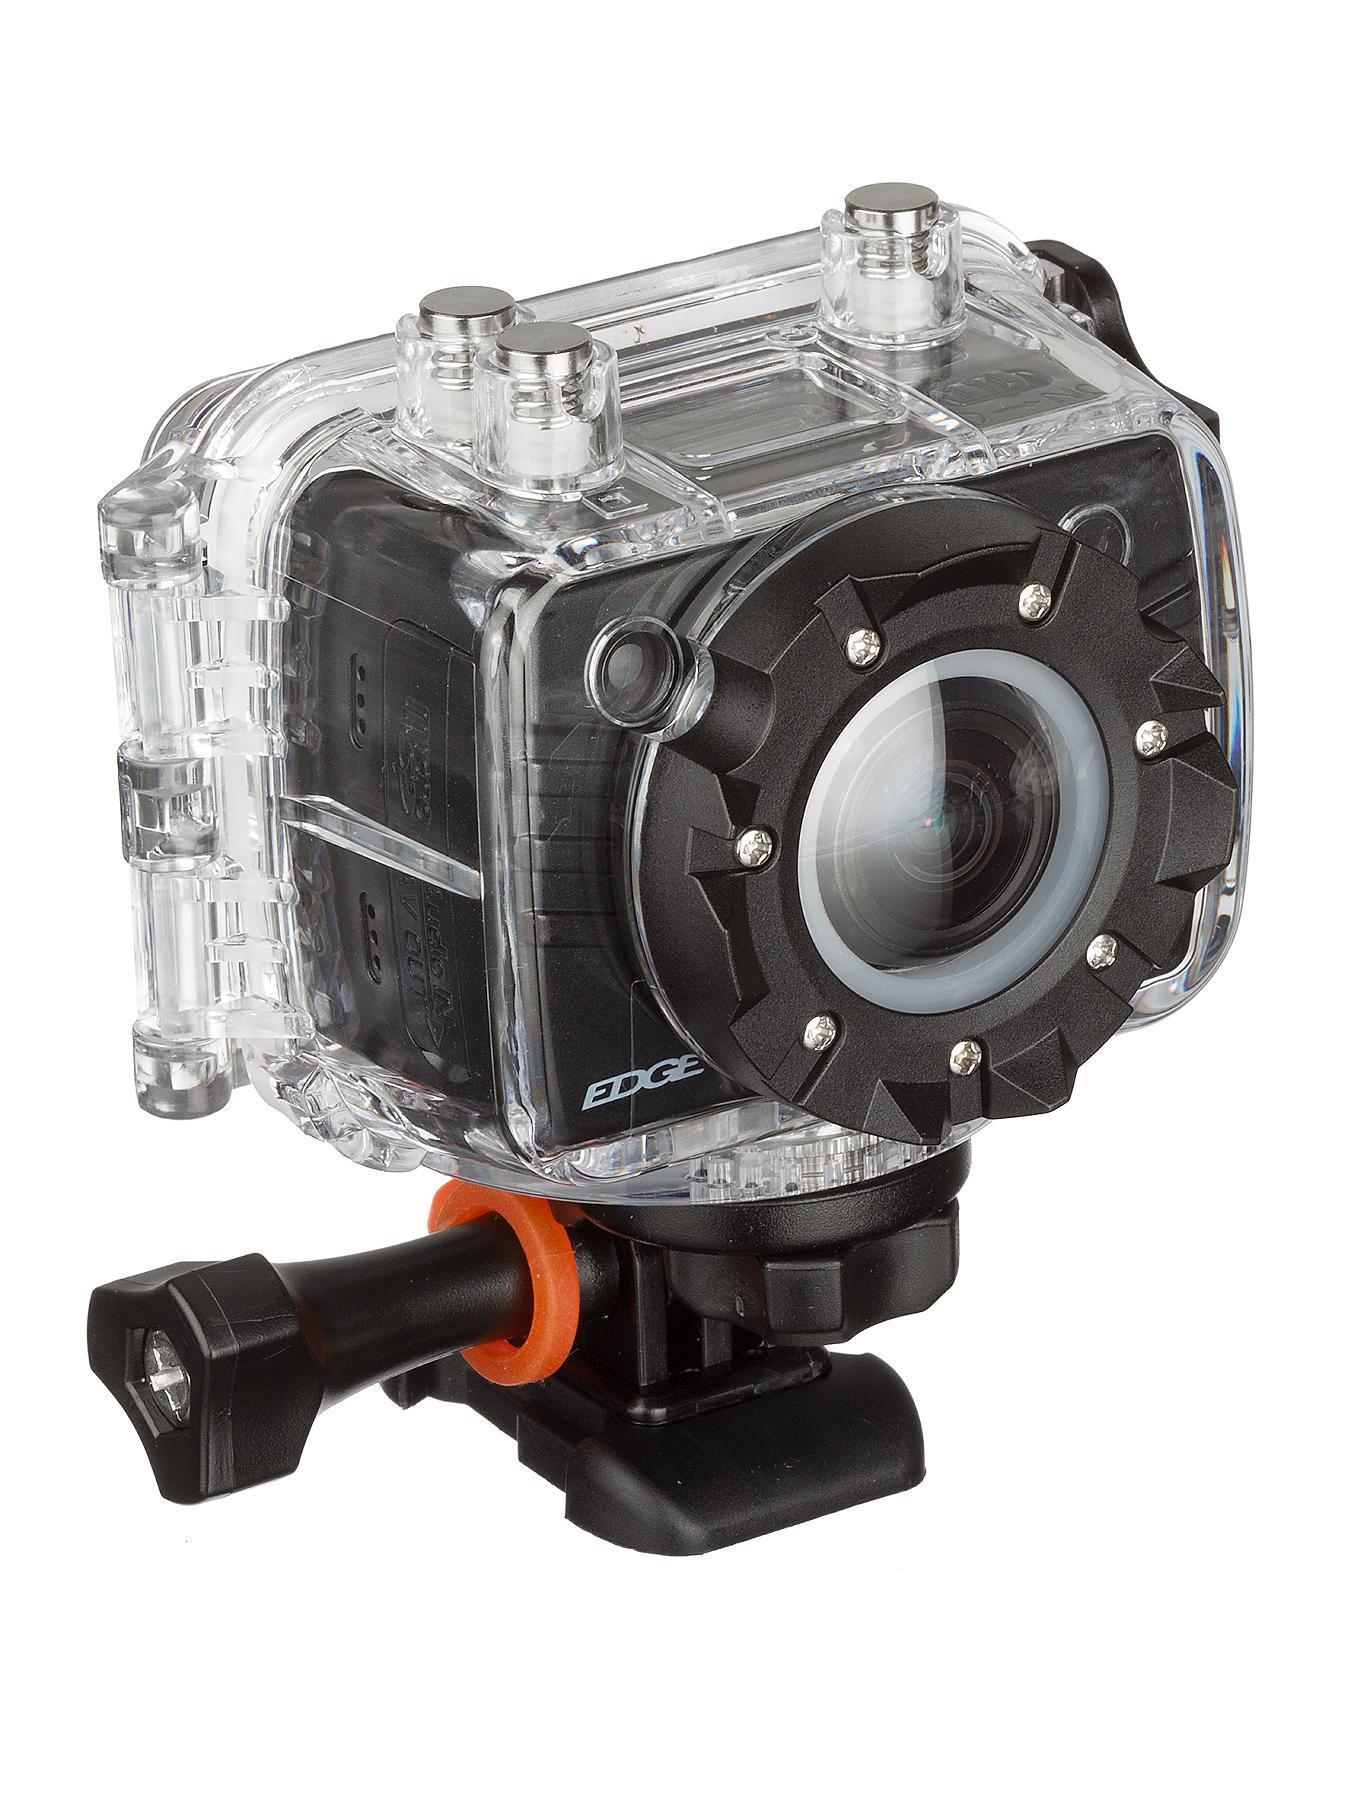 Kitvision Edge HD10 Action Camera - Black